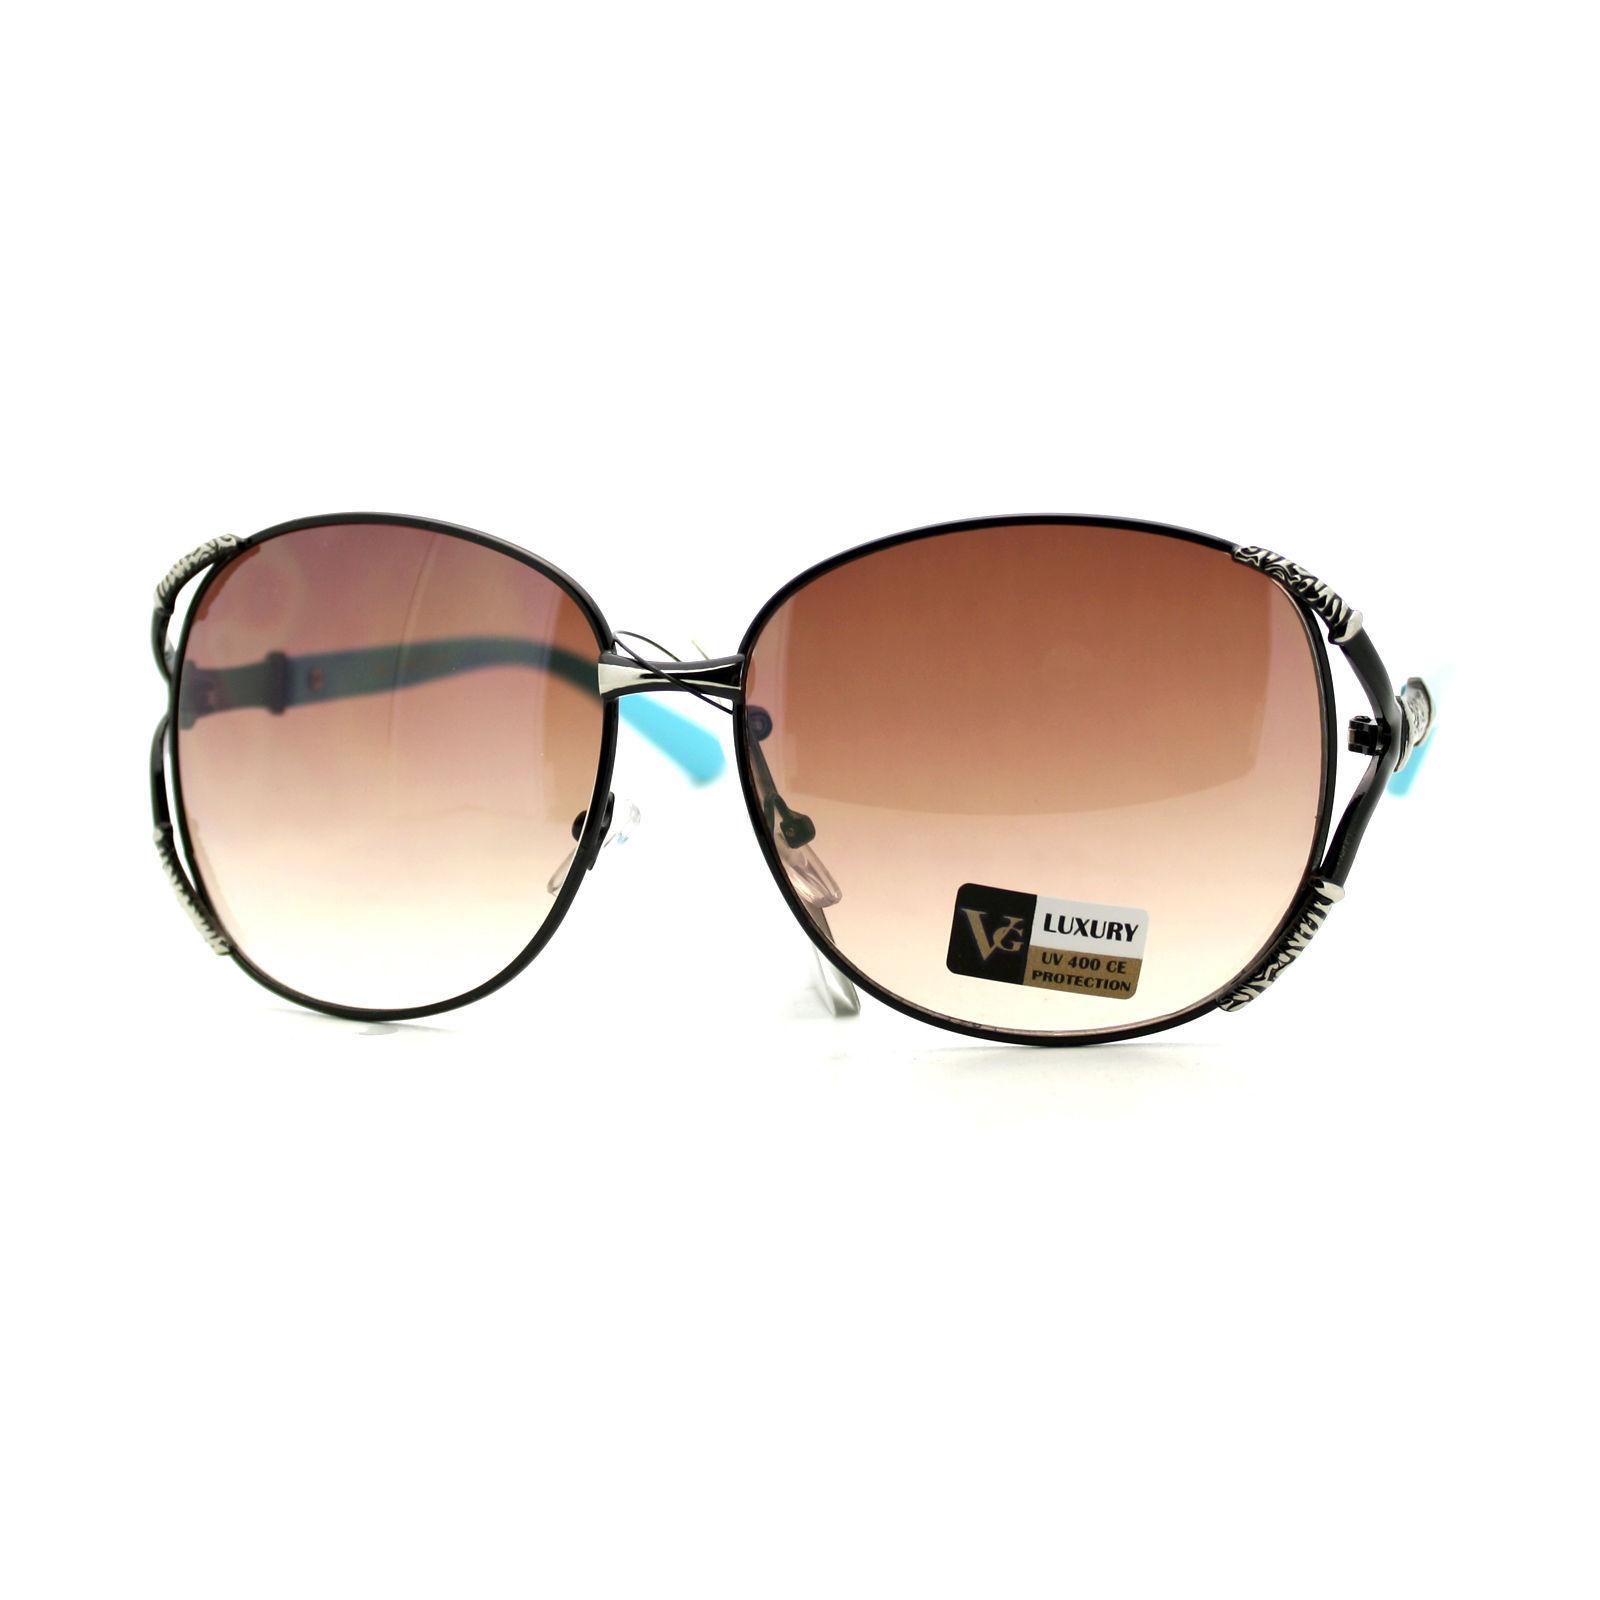 Womens Fashion Round Sunglasses Designer Luxury Classic Shades UV 400